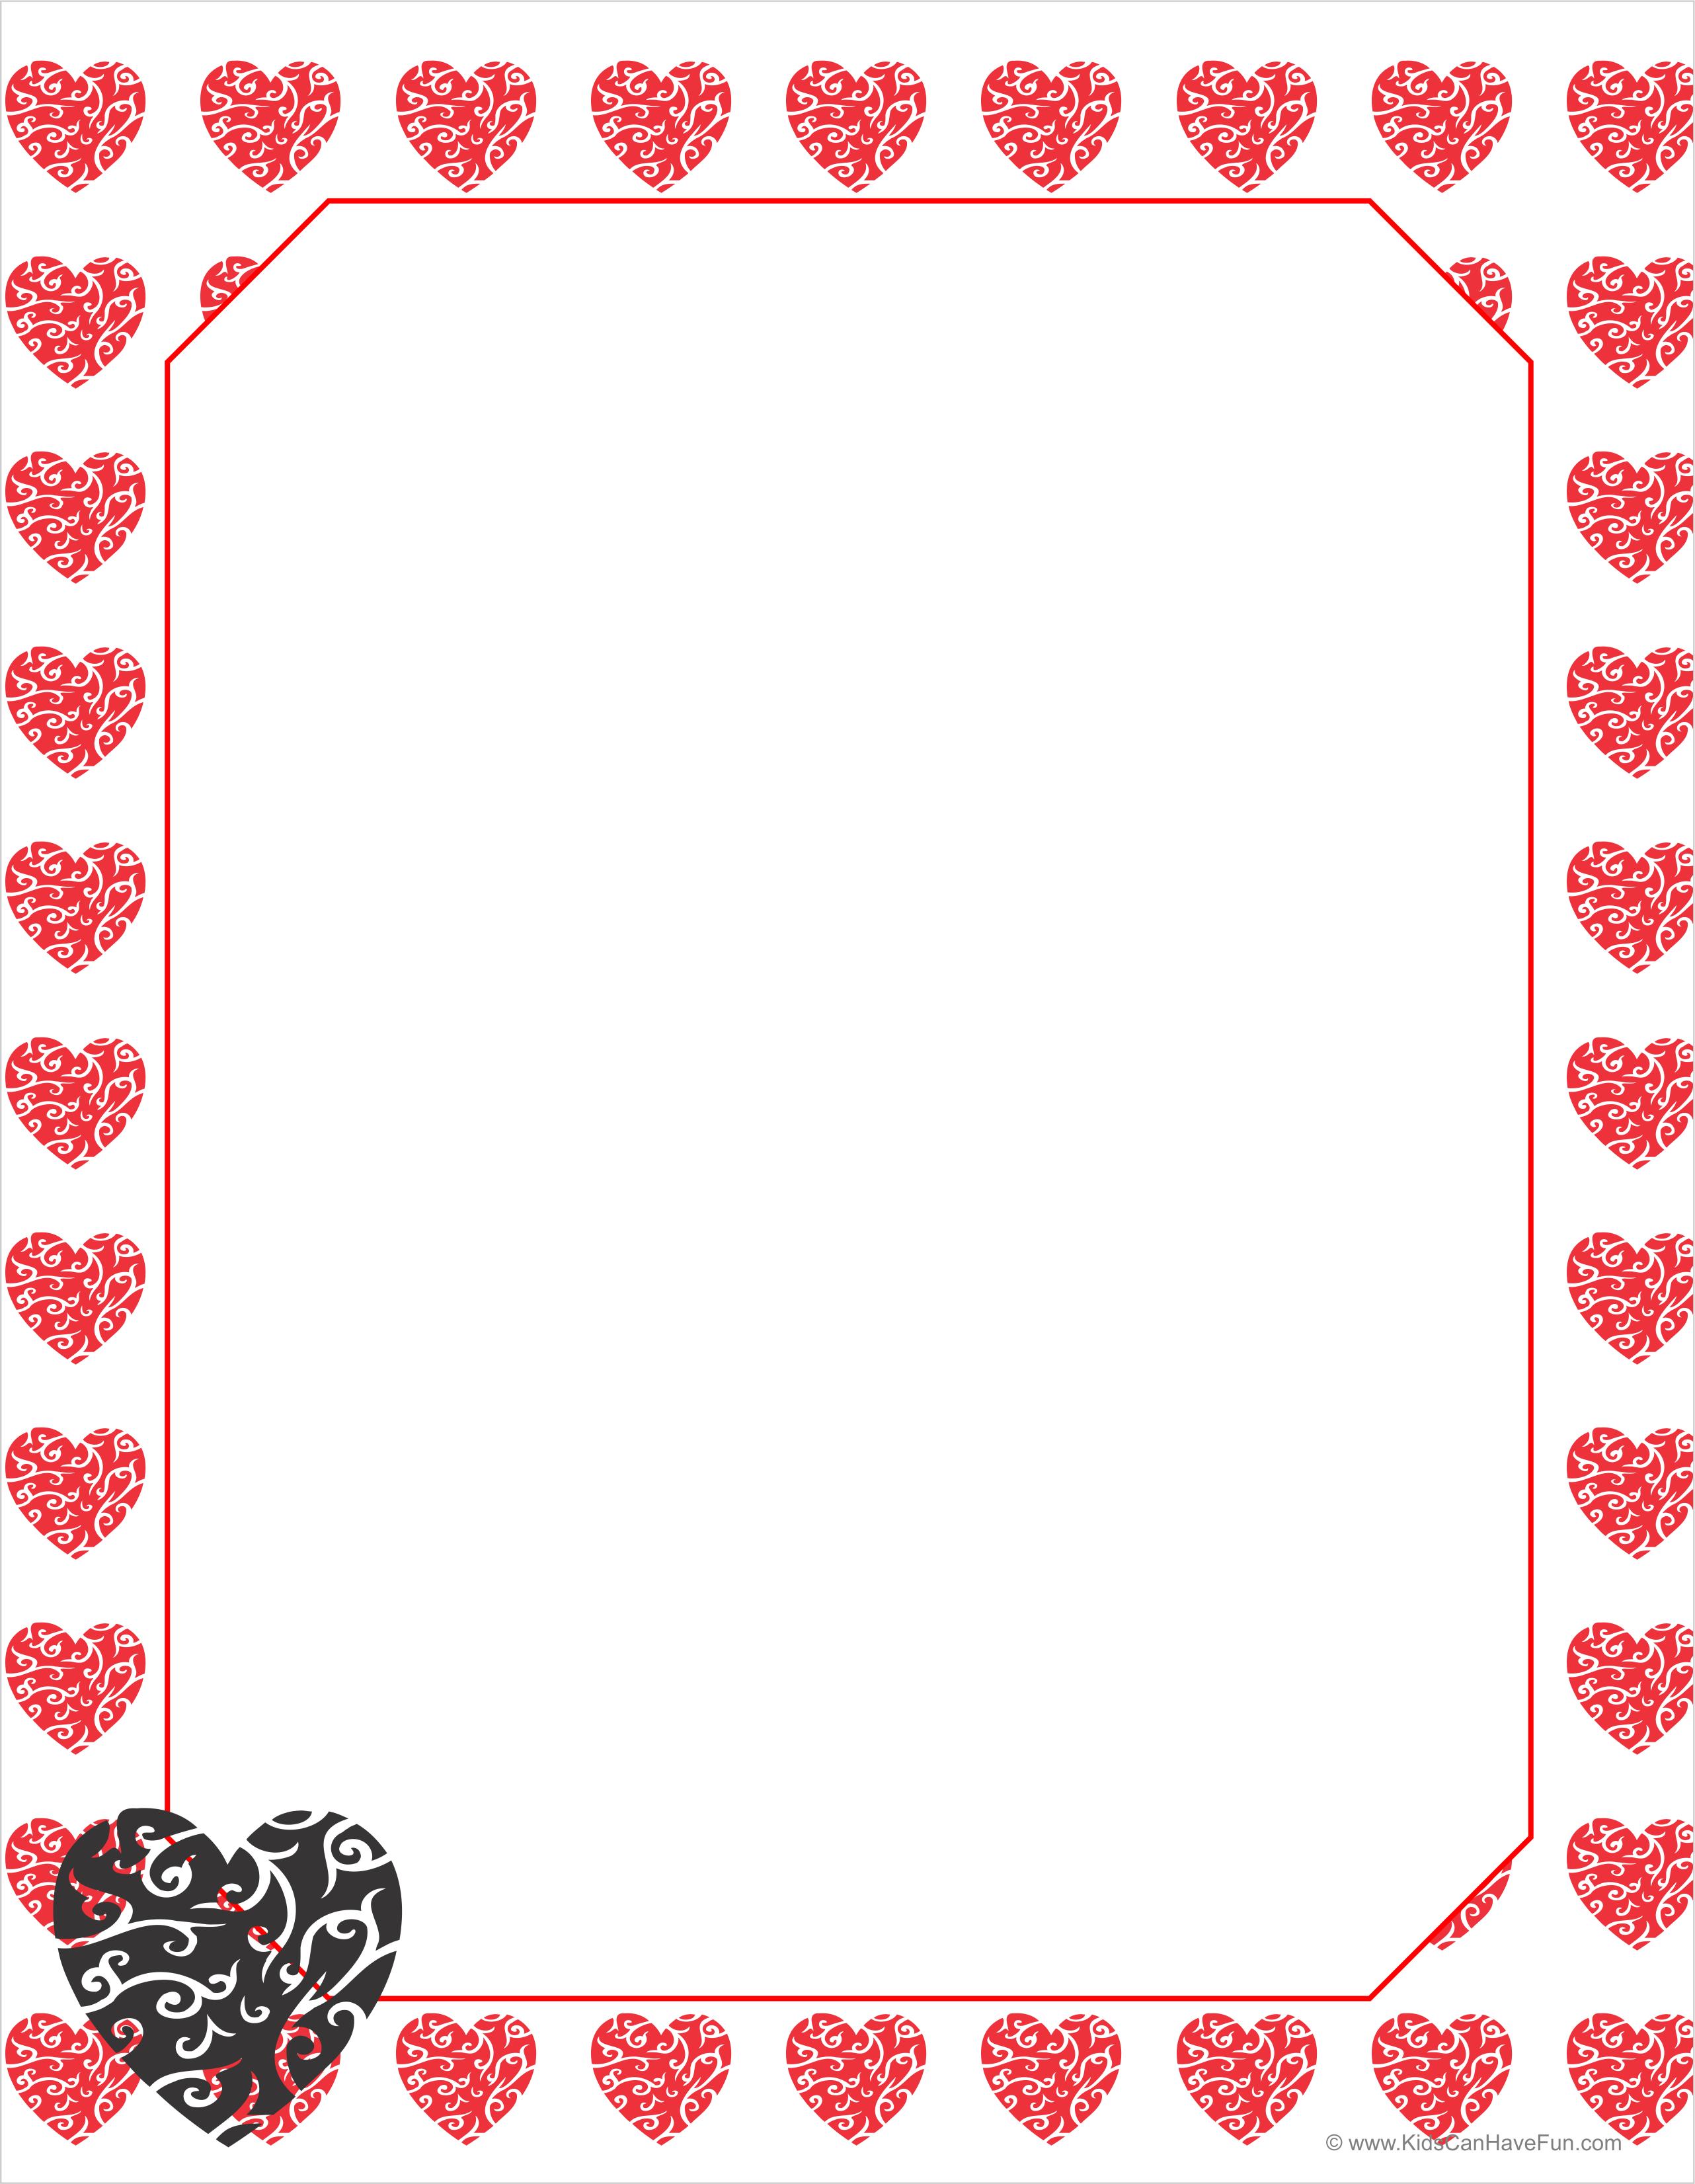 Pin By Kidscanhavefun On Valentines Day Ideas Candy